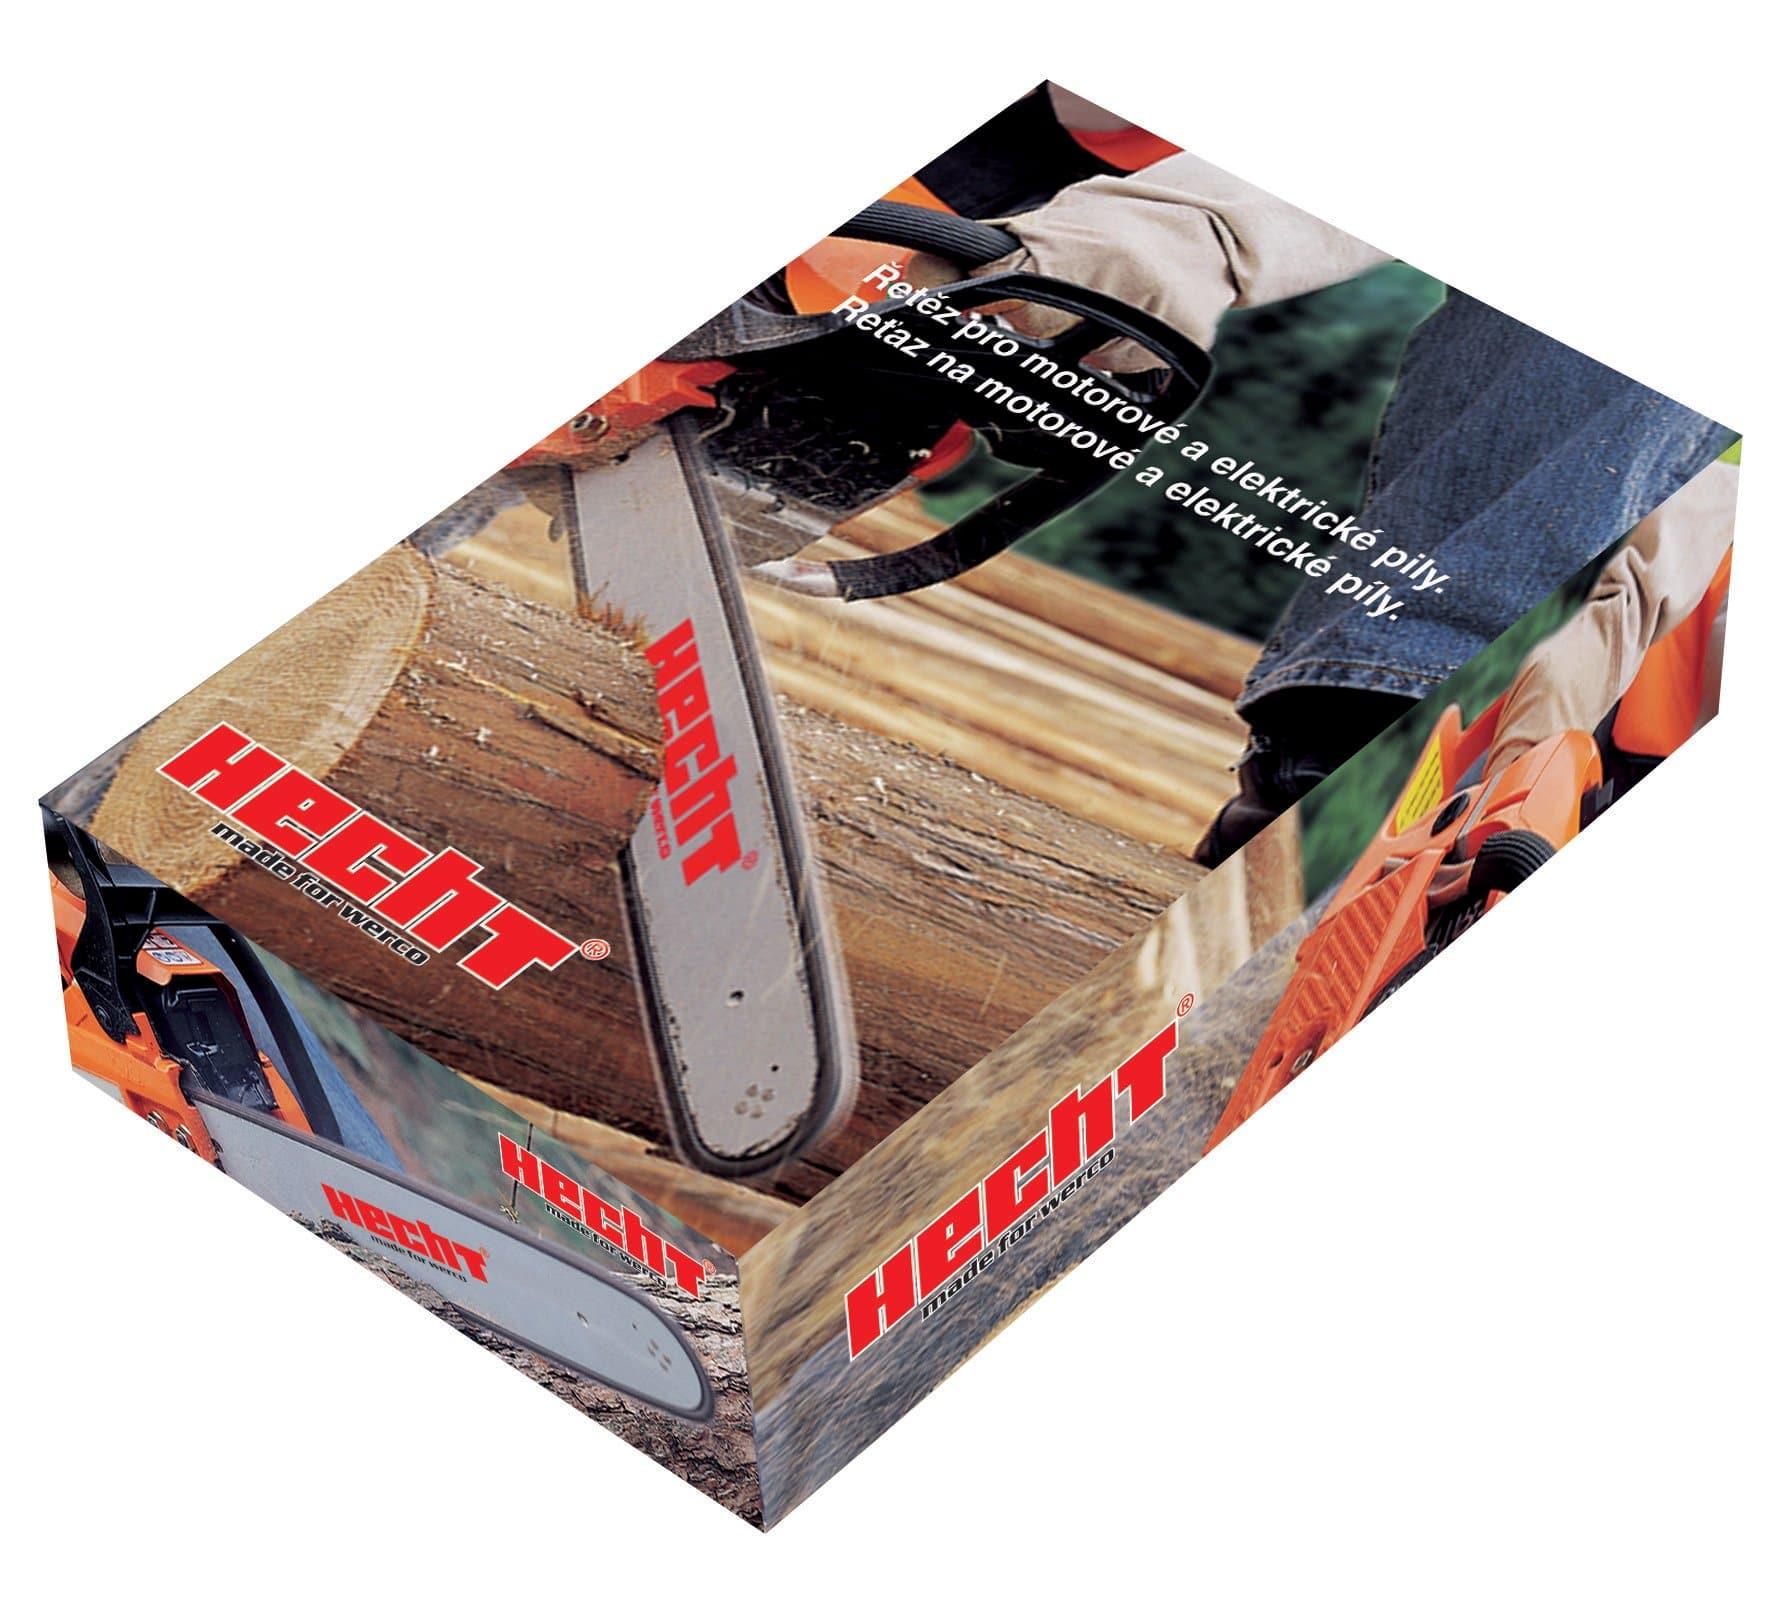 Corrente Motosserra Universal - 0.325'' | 1,5mm | 66elos